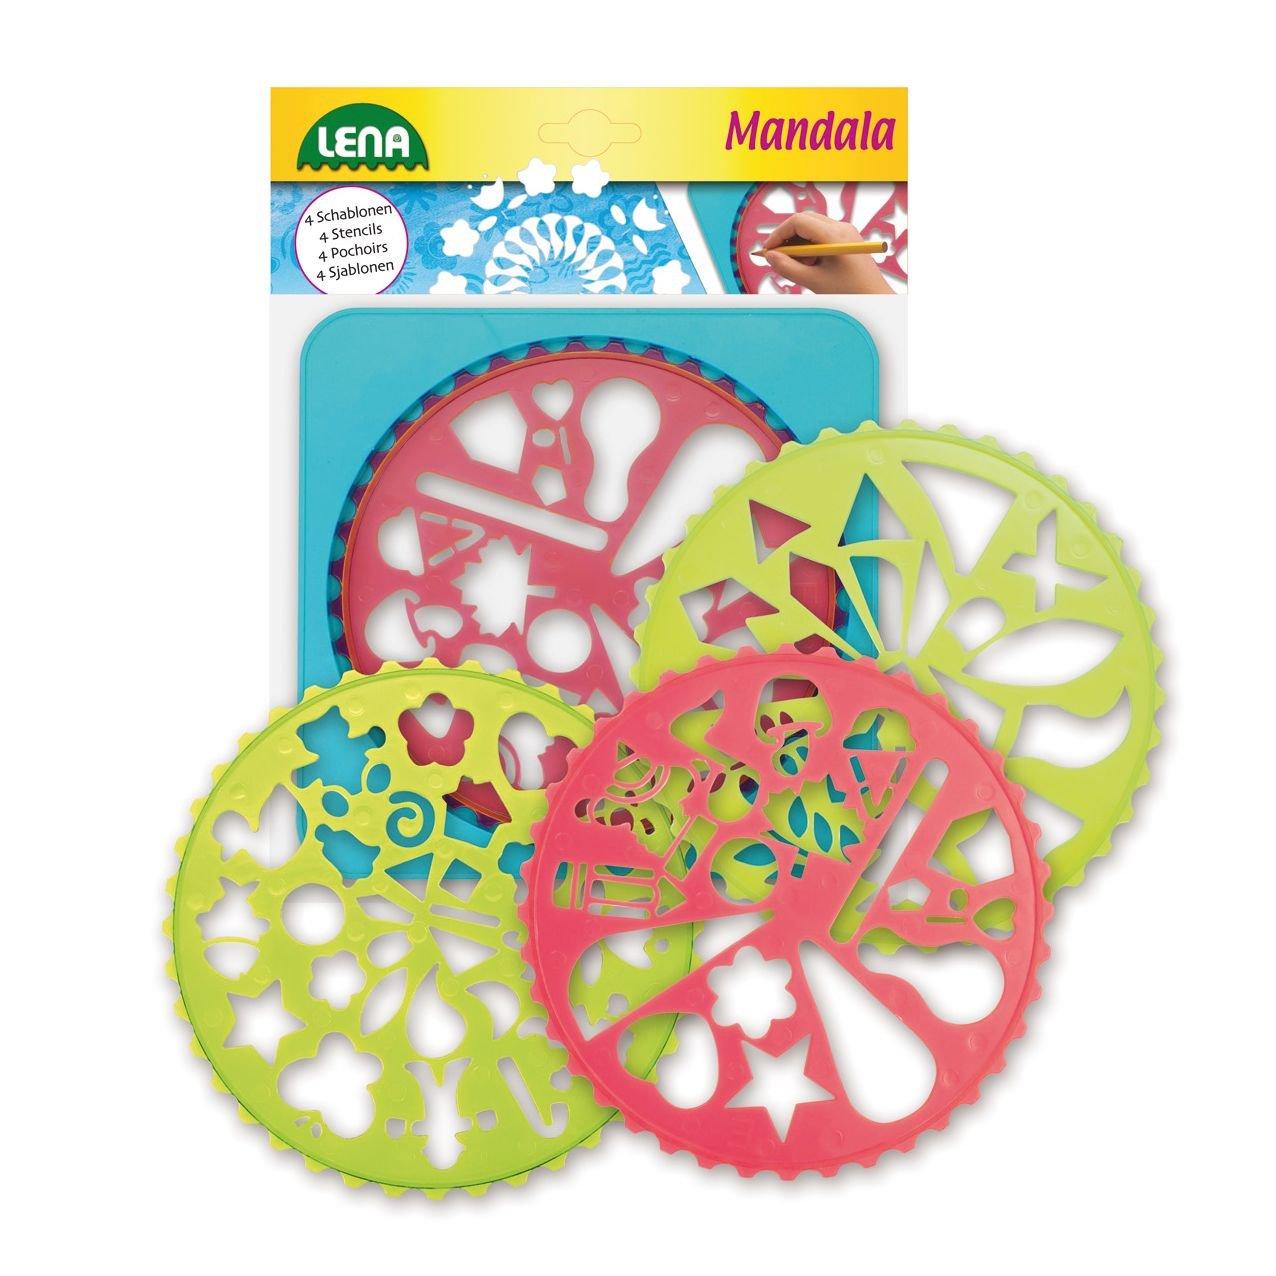 Lena 65775 - Malset Mandala Designer mit Rahmen und 4 Schablonen